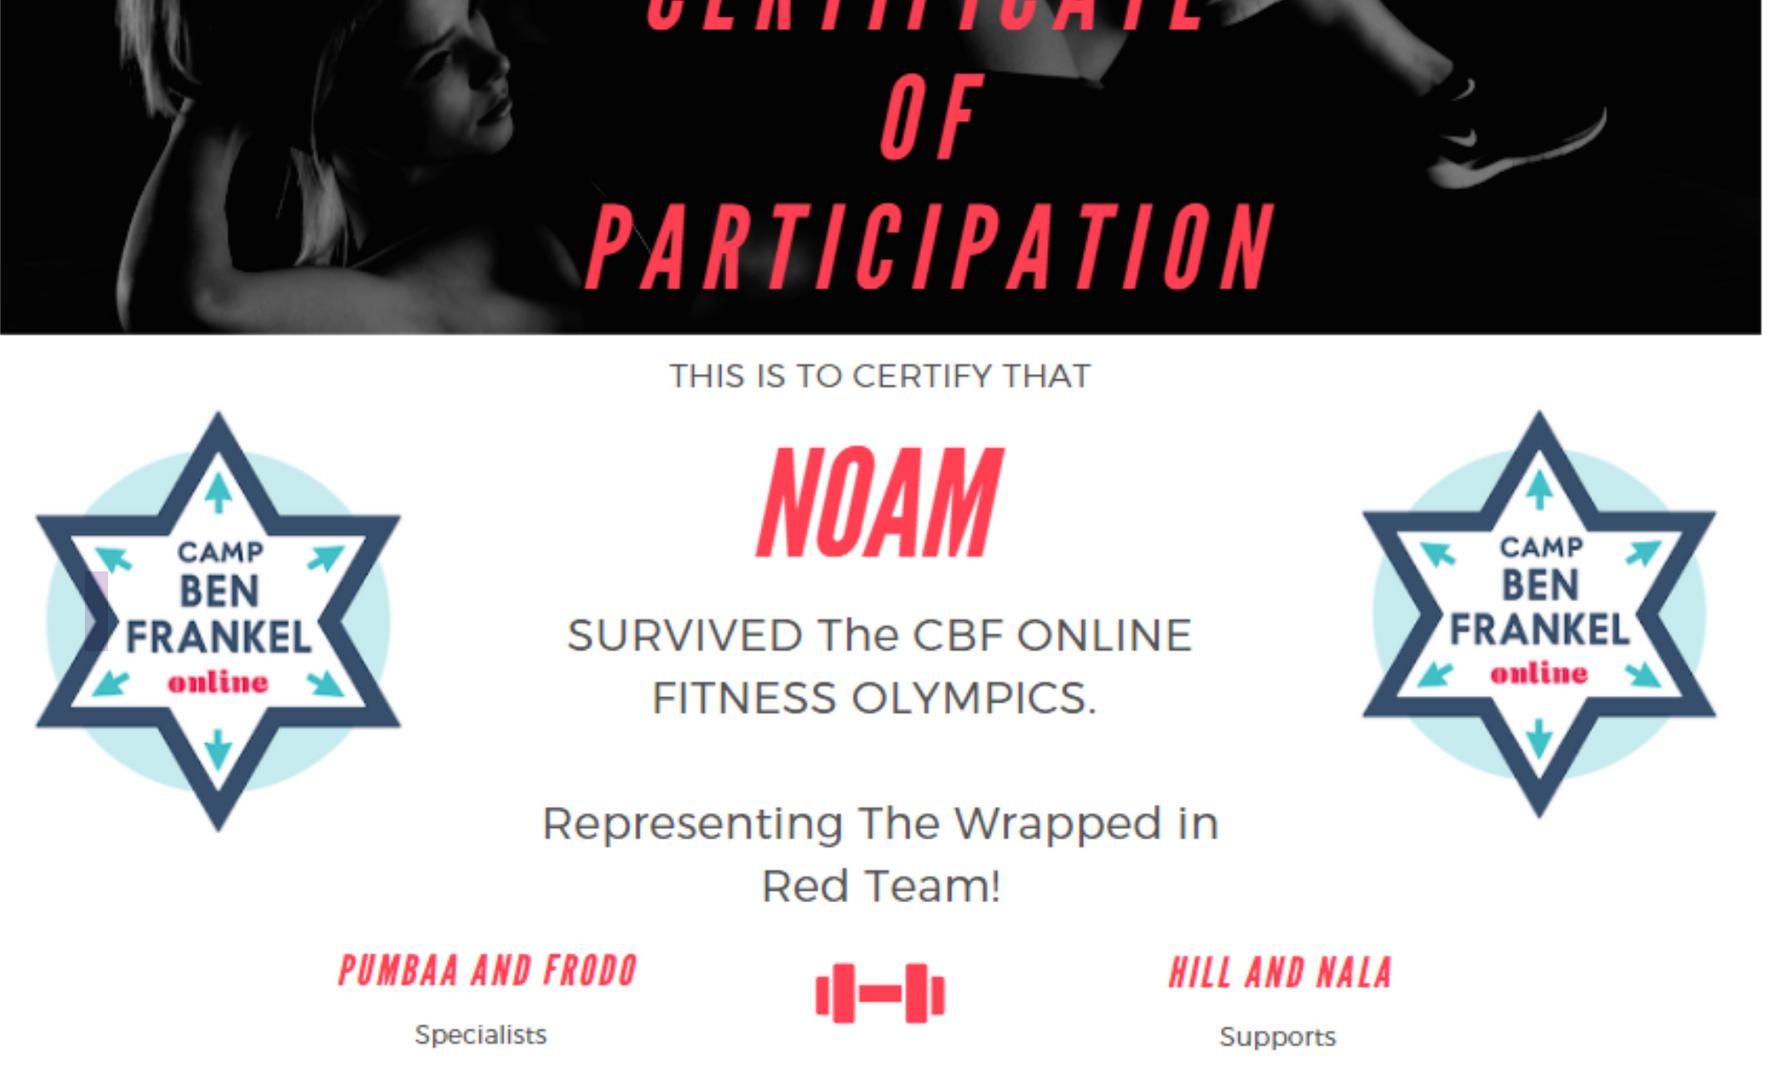 Noam's Certificate of Participation